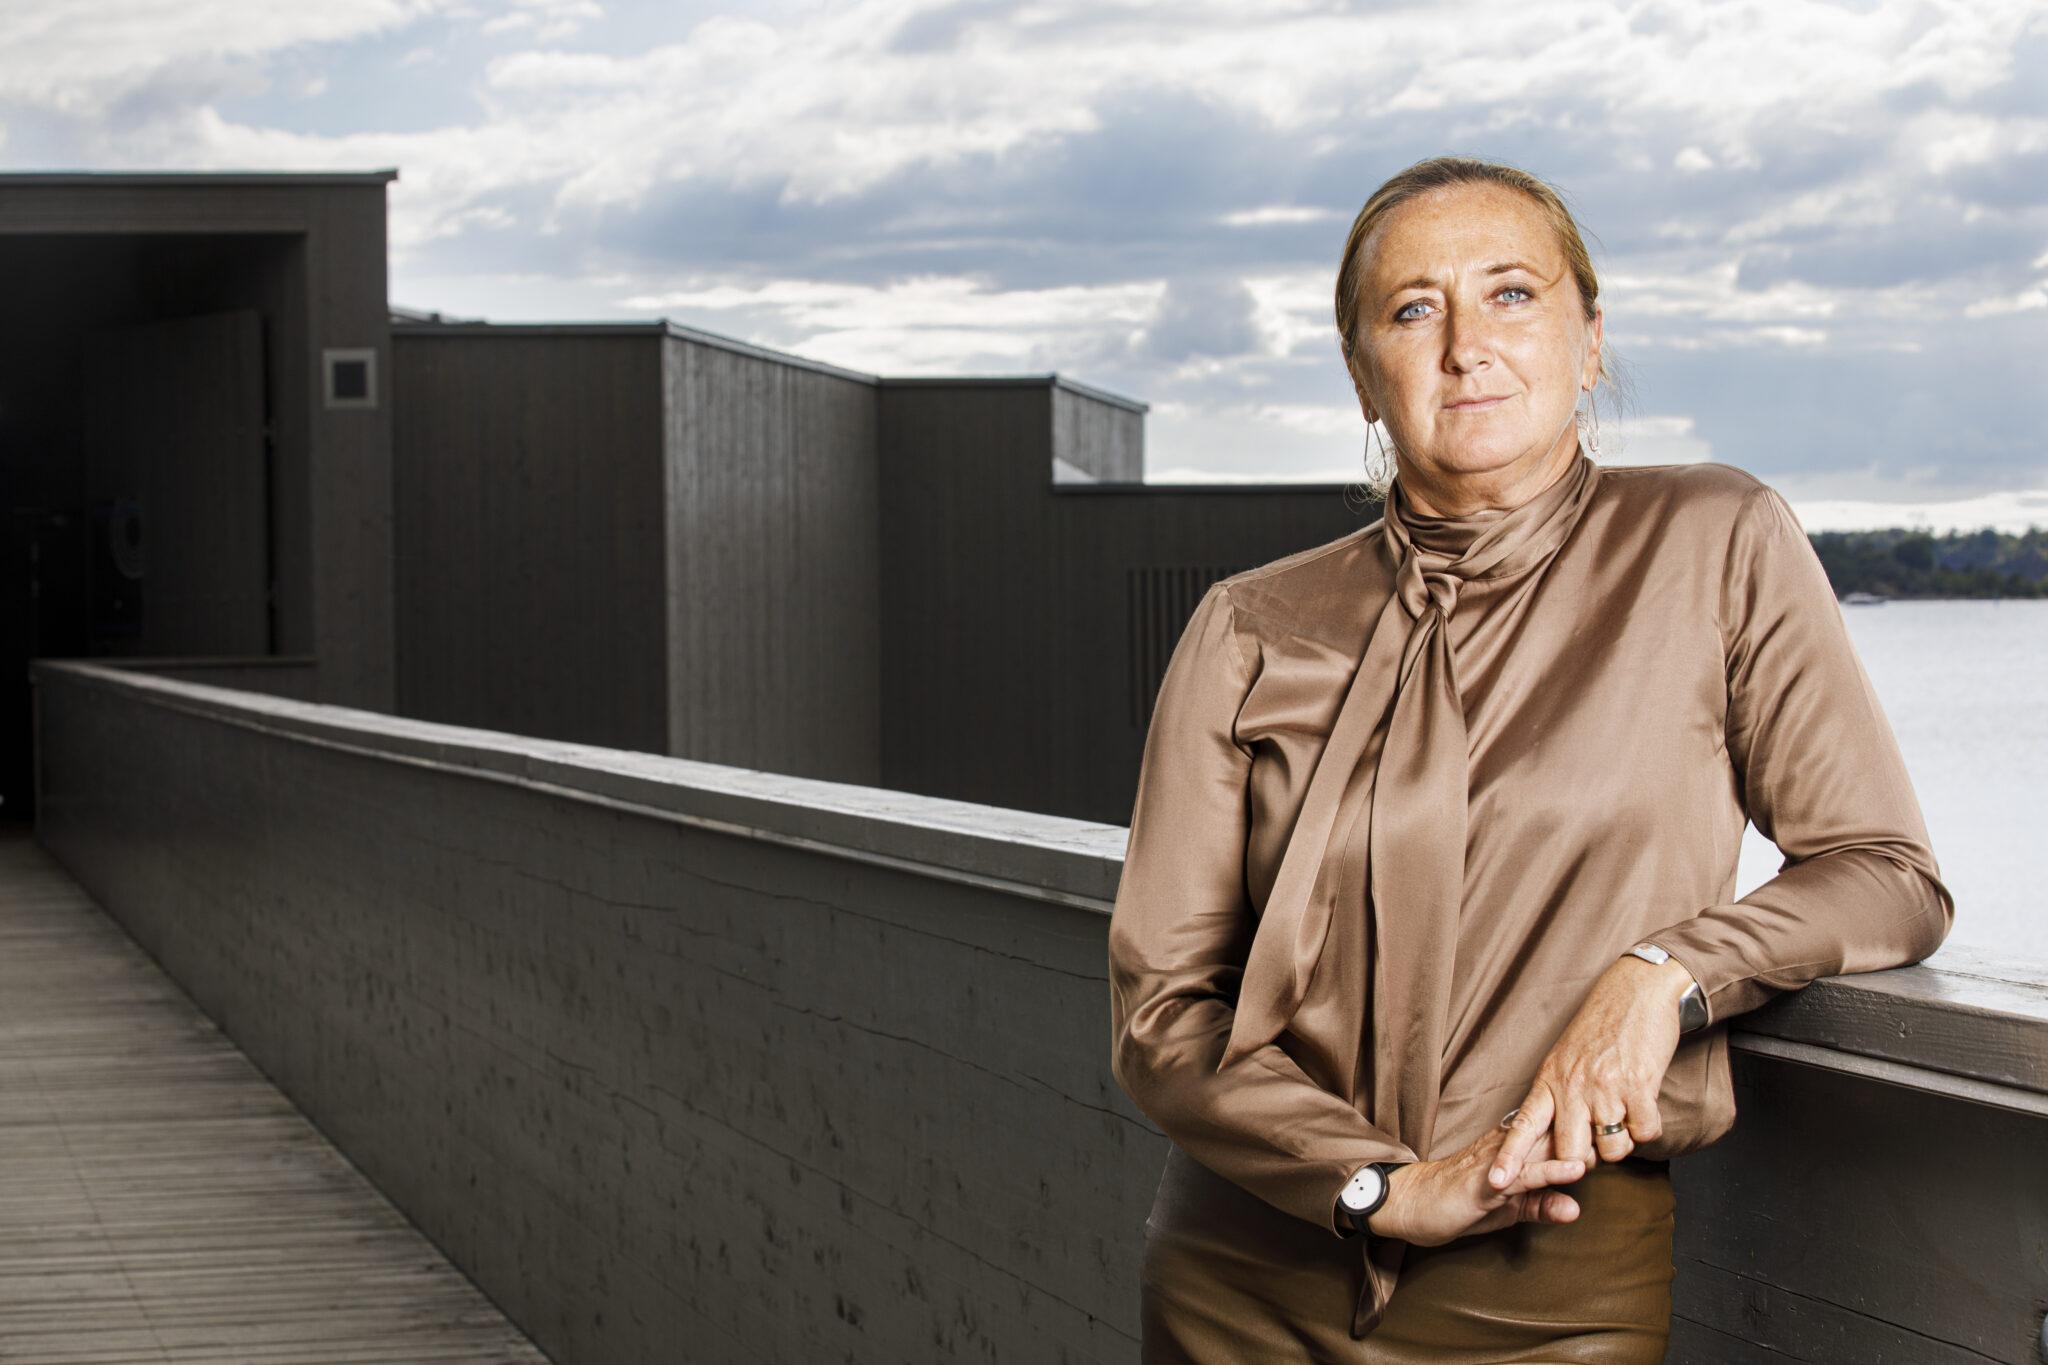 Emina Kovacic, stadsarkitekt i Karlshamn. Foto: Lars Jansson